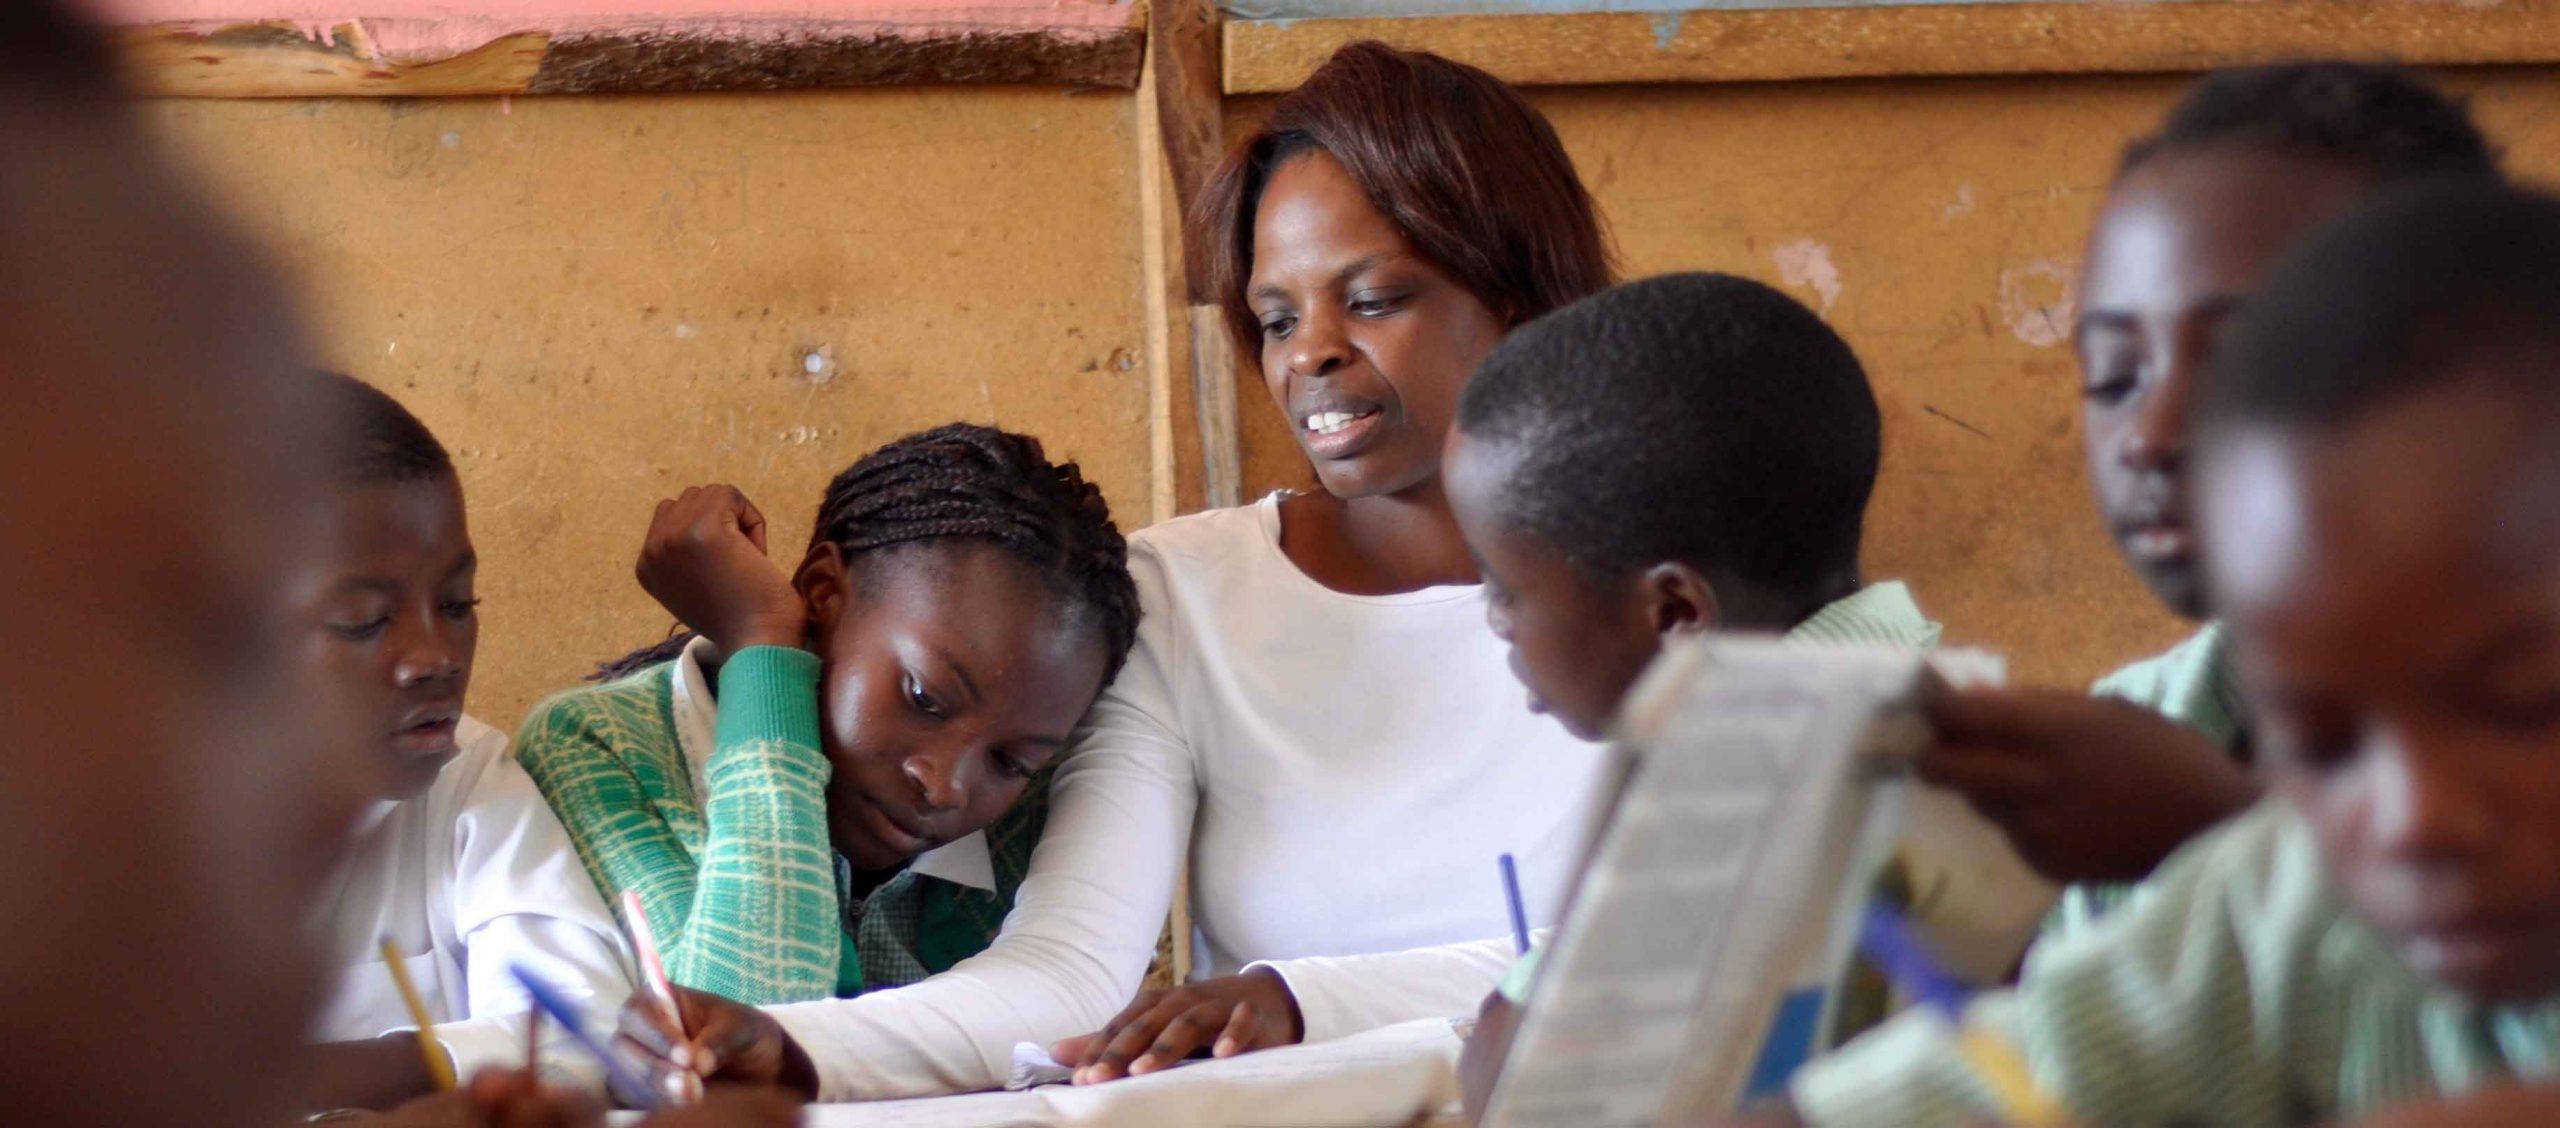 Women teaching children in classroom